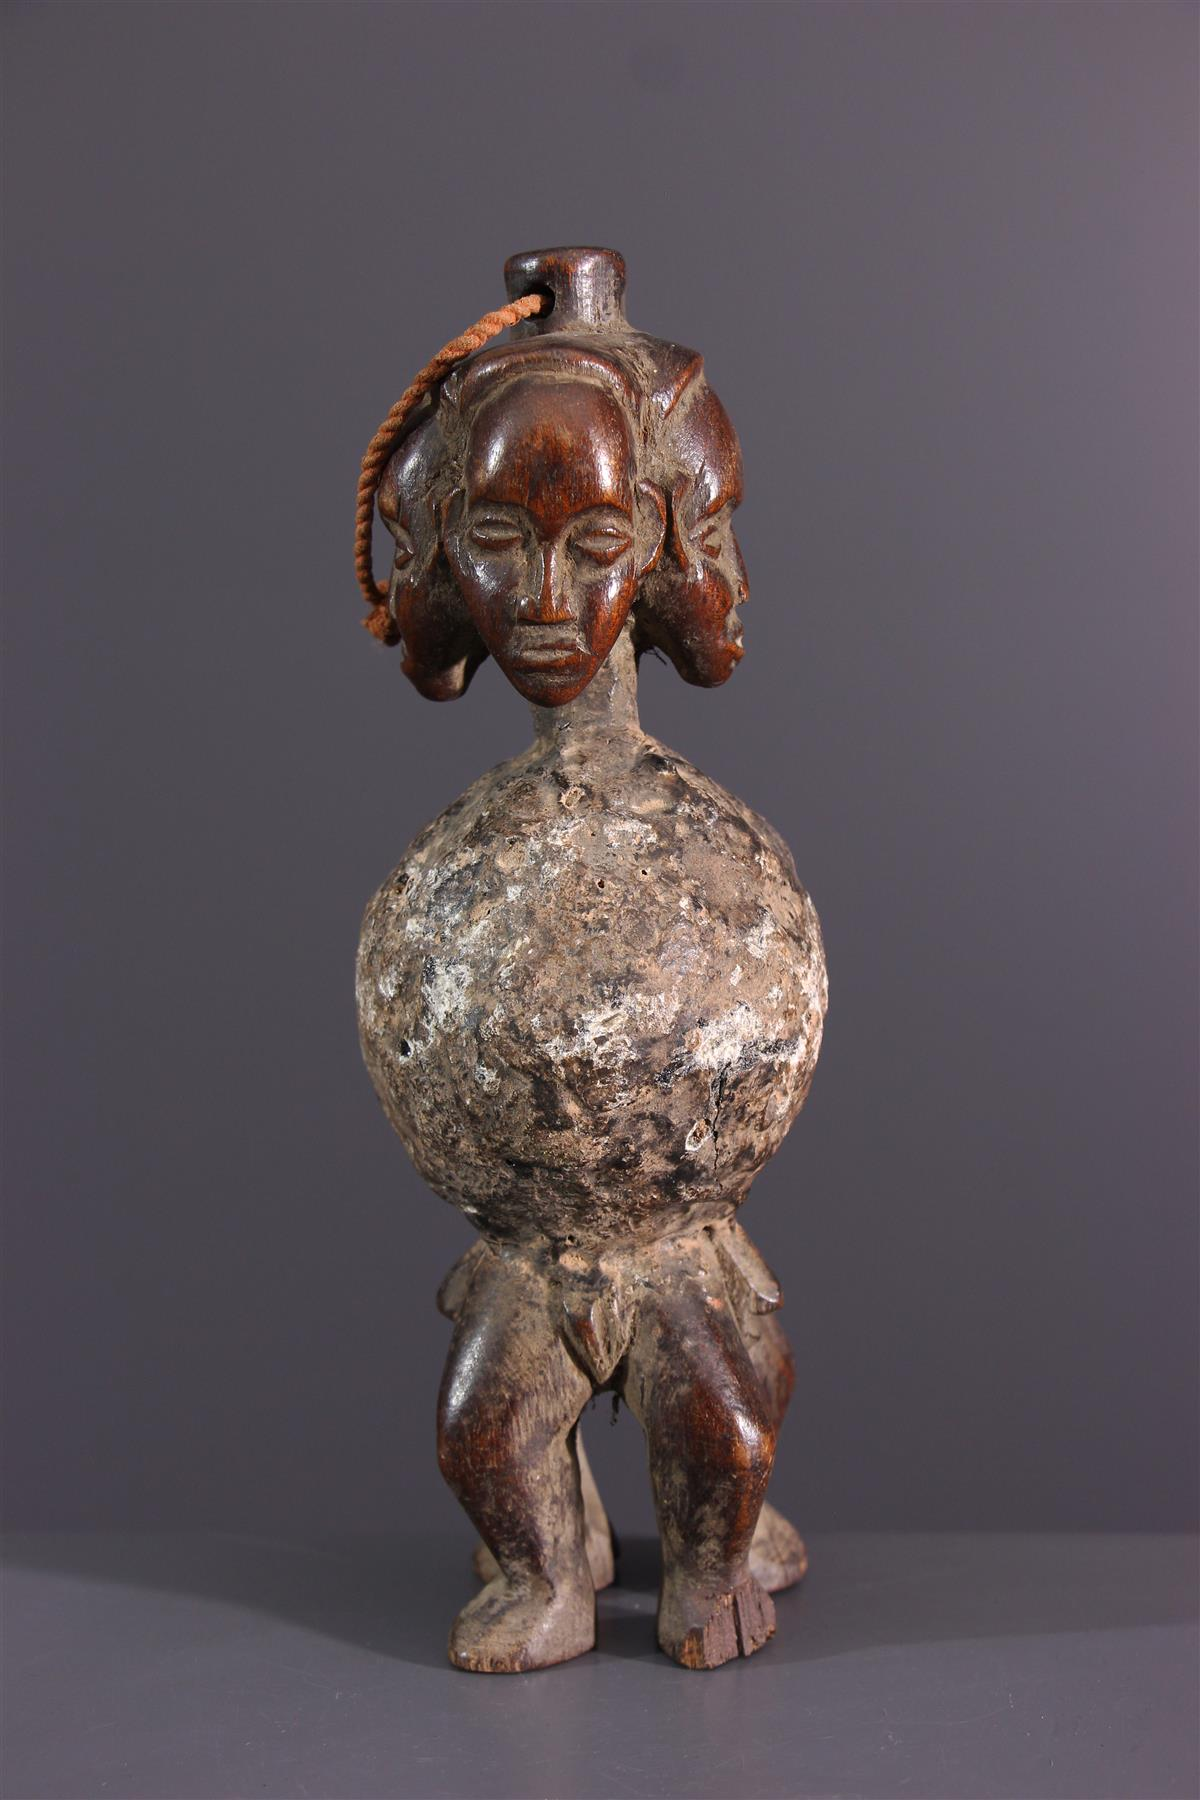 Vili fetisj - Afrikaanse kunst